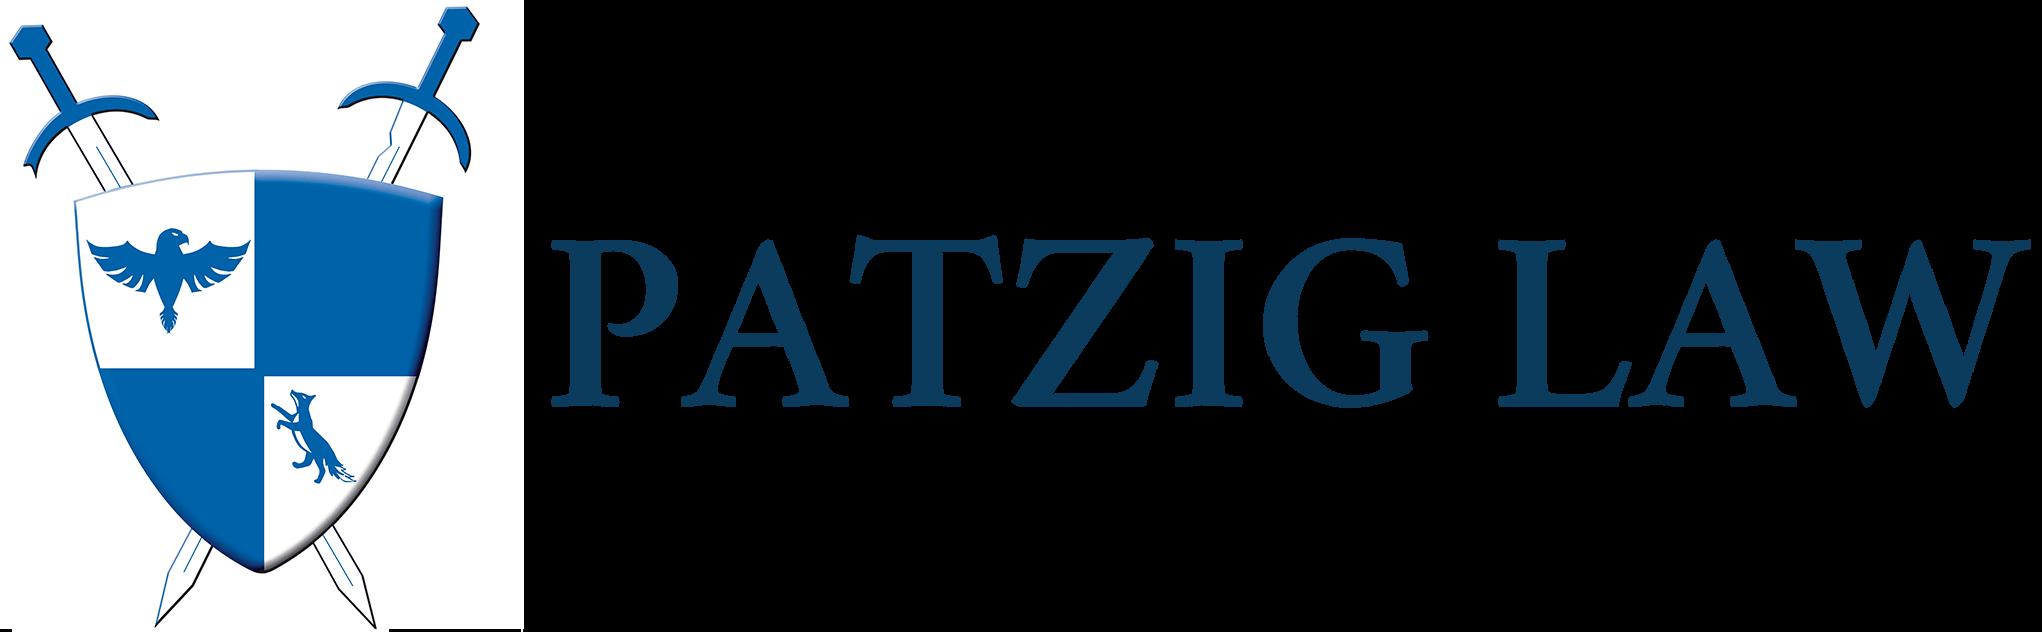 Patzig Law